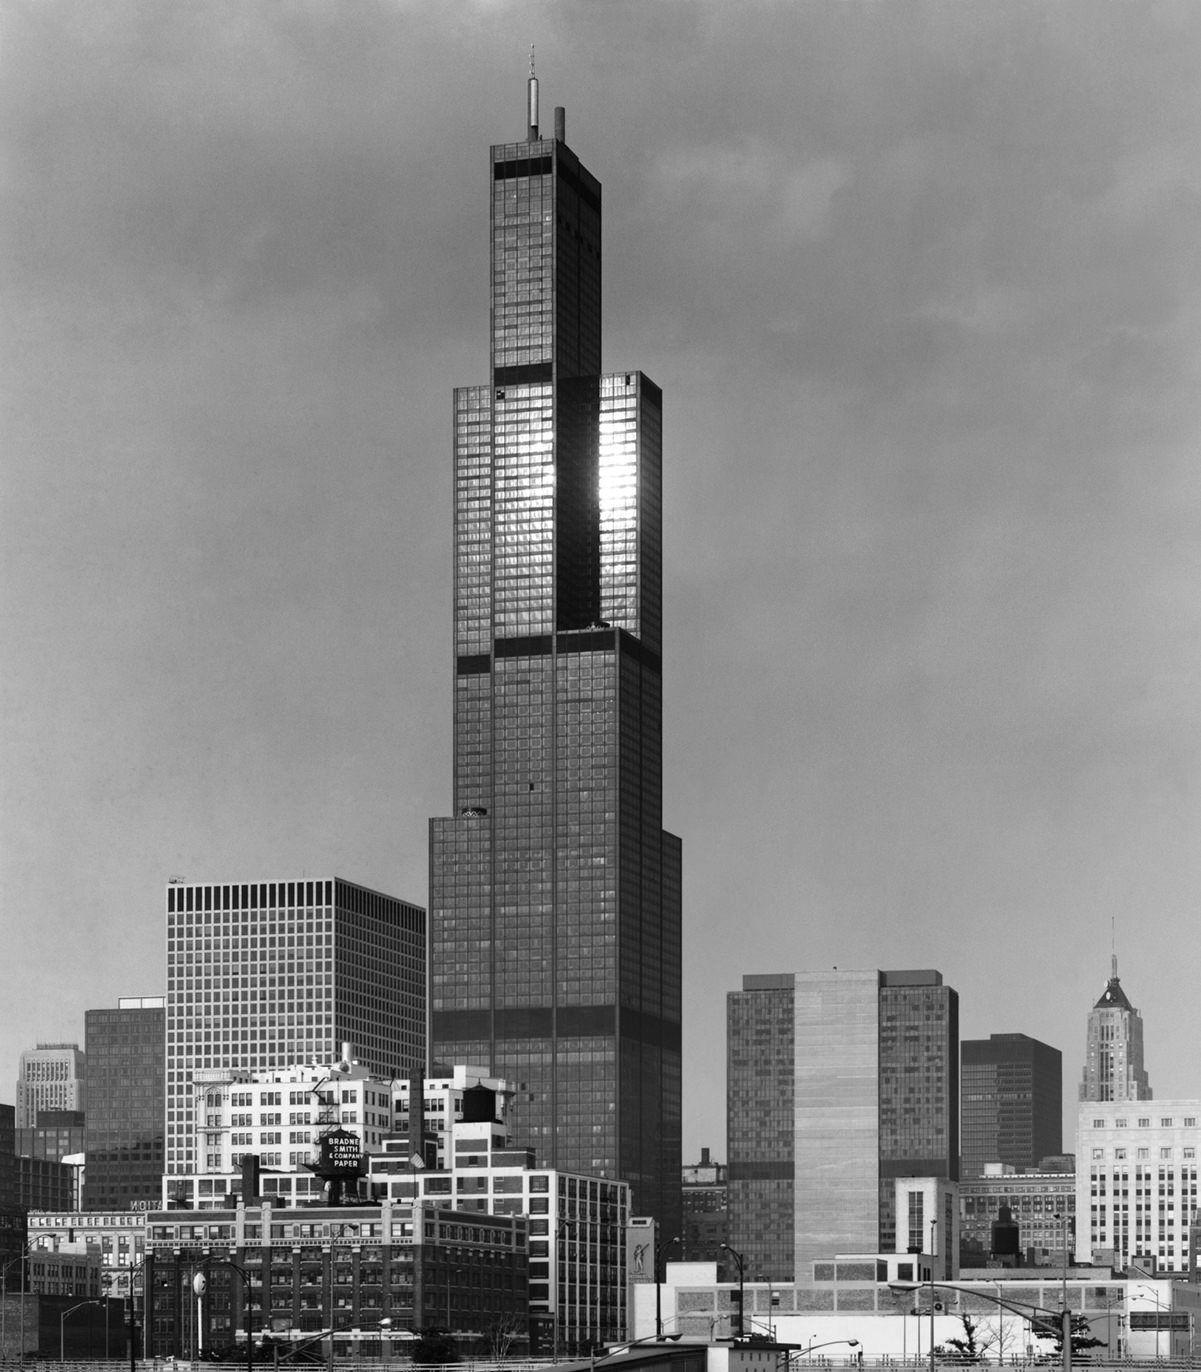 Willis Tower Sears Chicago Il 1974 Som Ezra Stoller Esto Archi